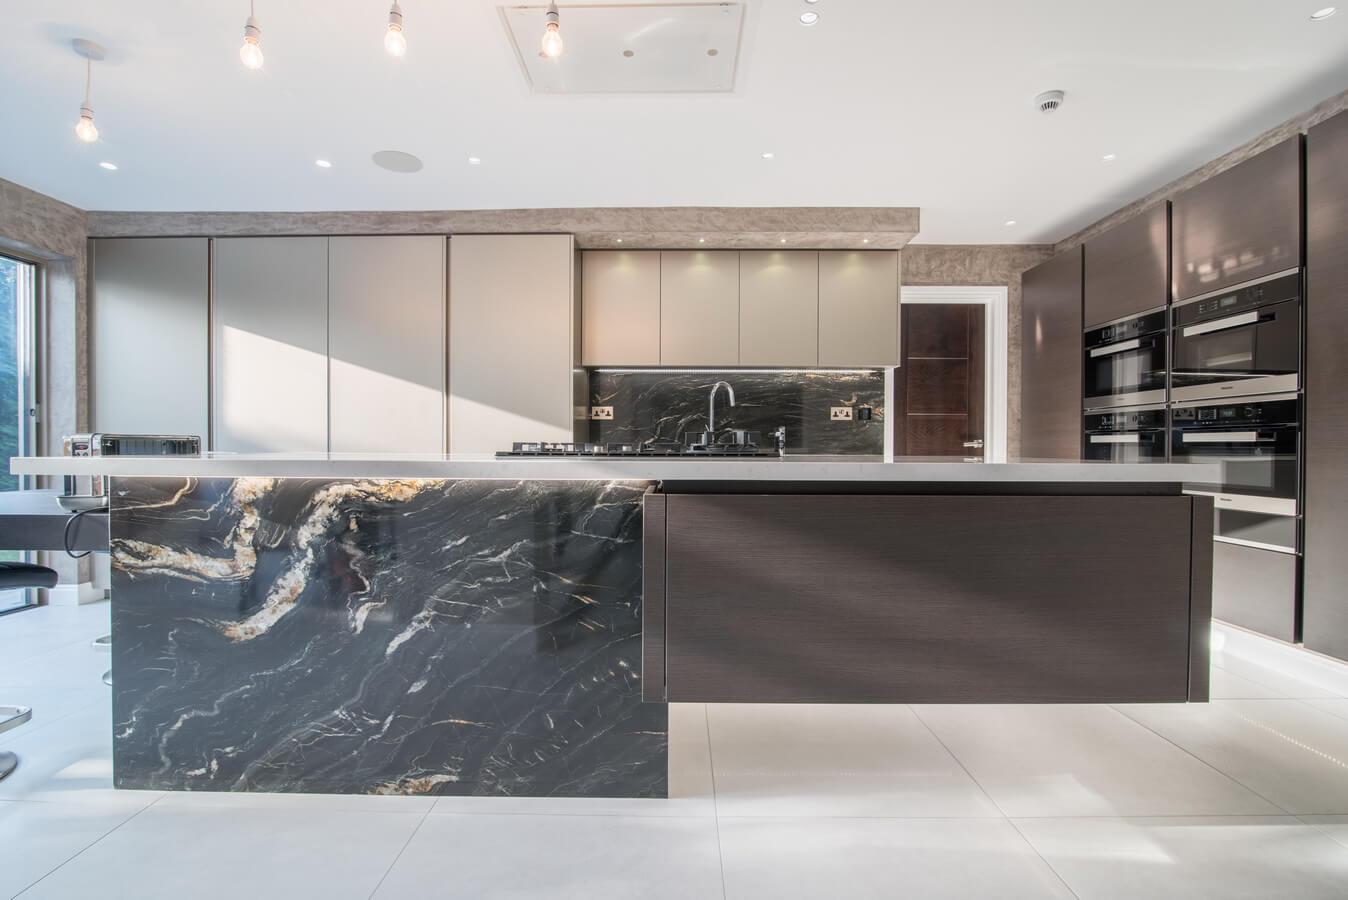 warendorf-kitchen-island-semi-matt-finish.jpg